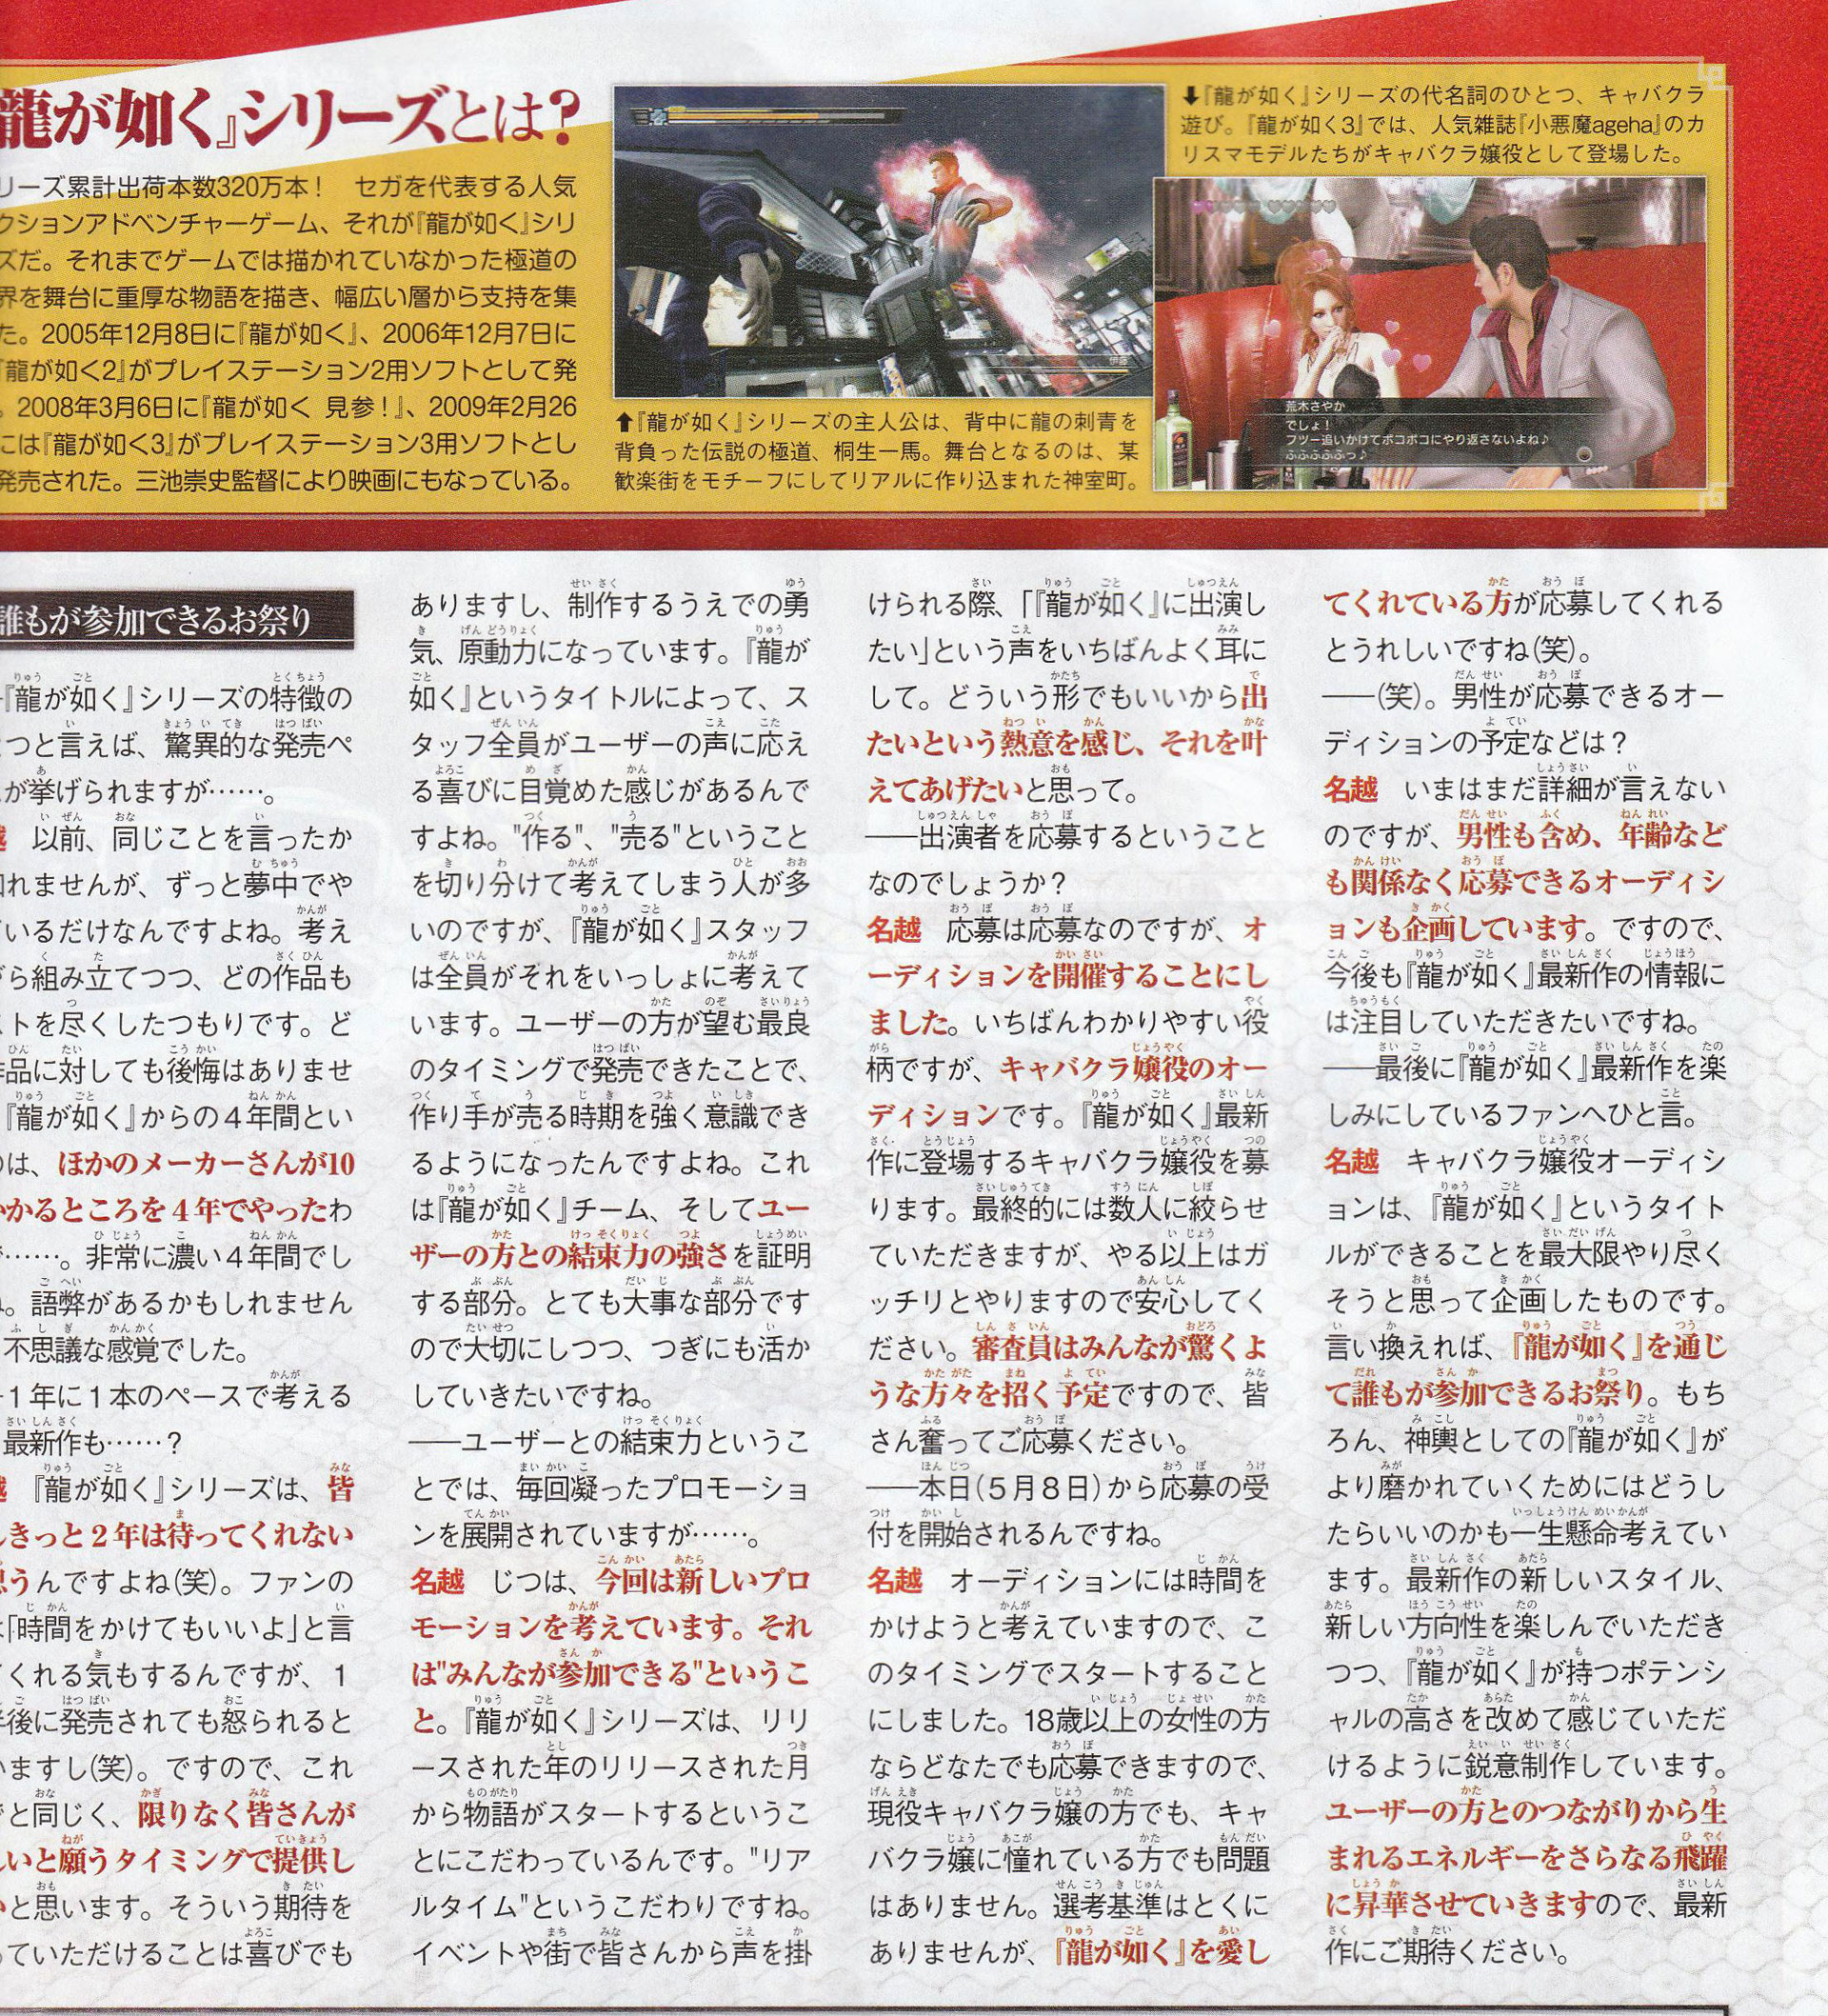 next-yakuza-in-dev-scans_2009_05-07-09_02